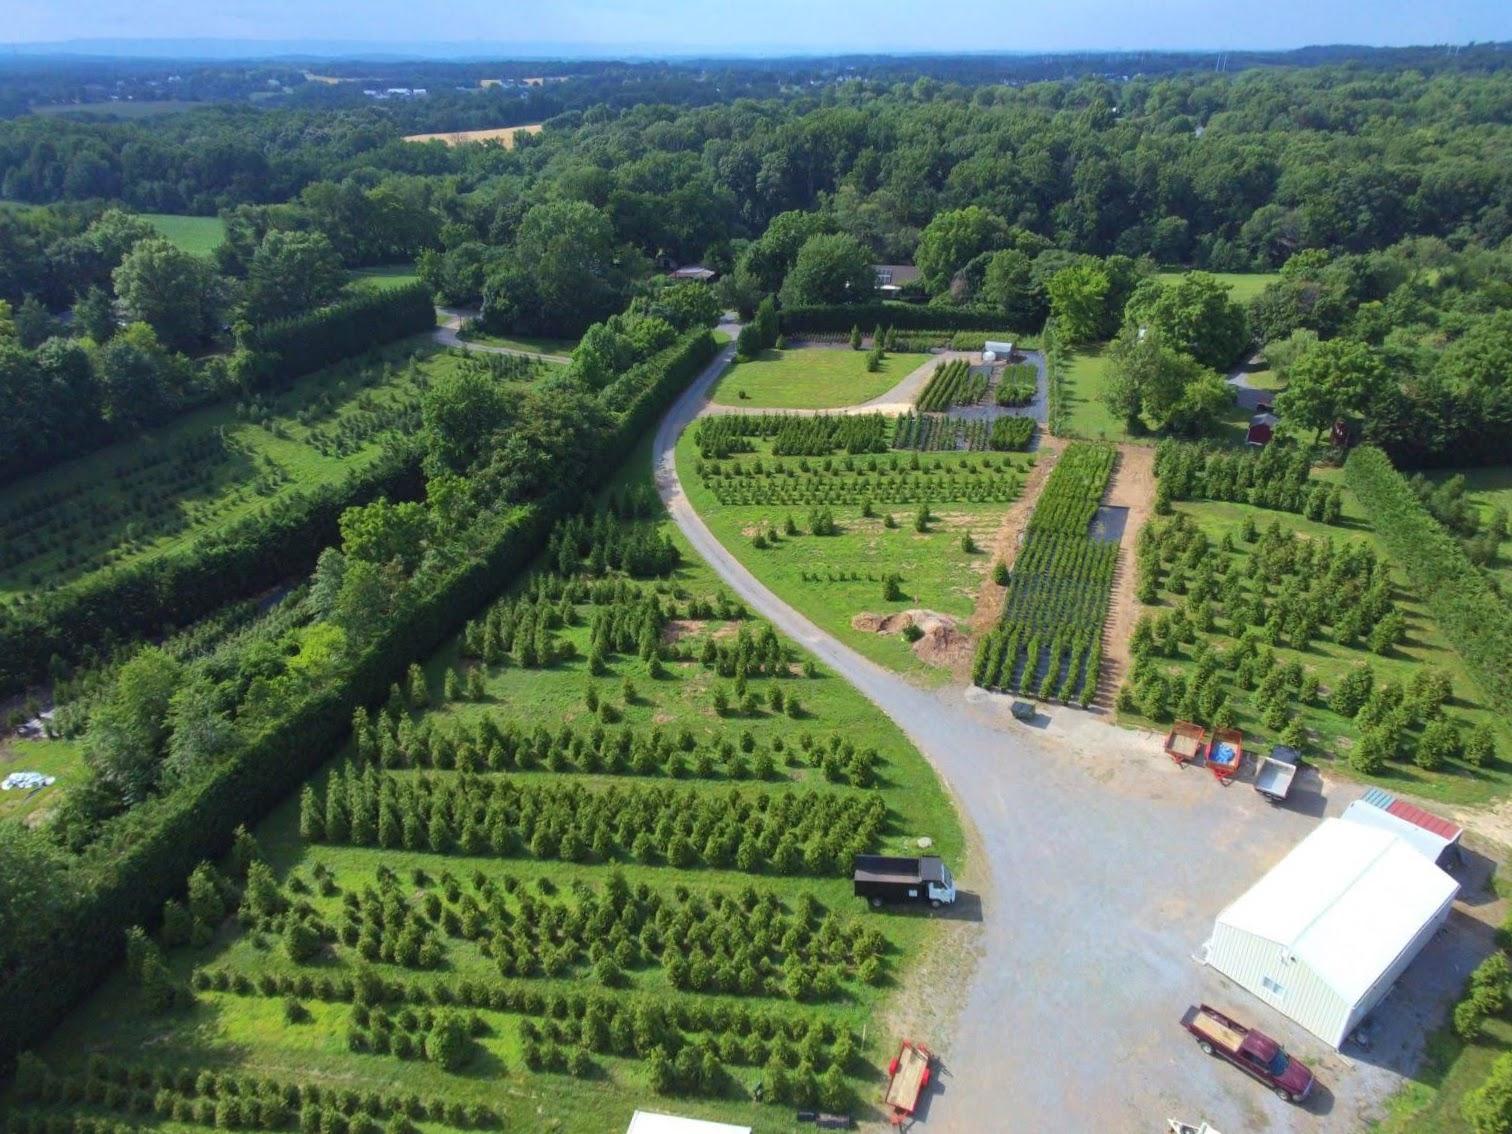 Pryor's Nursery Evergreen Tree Farm